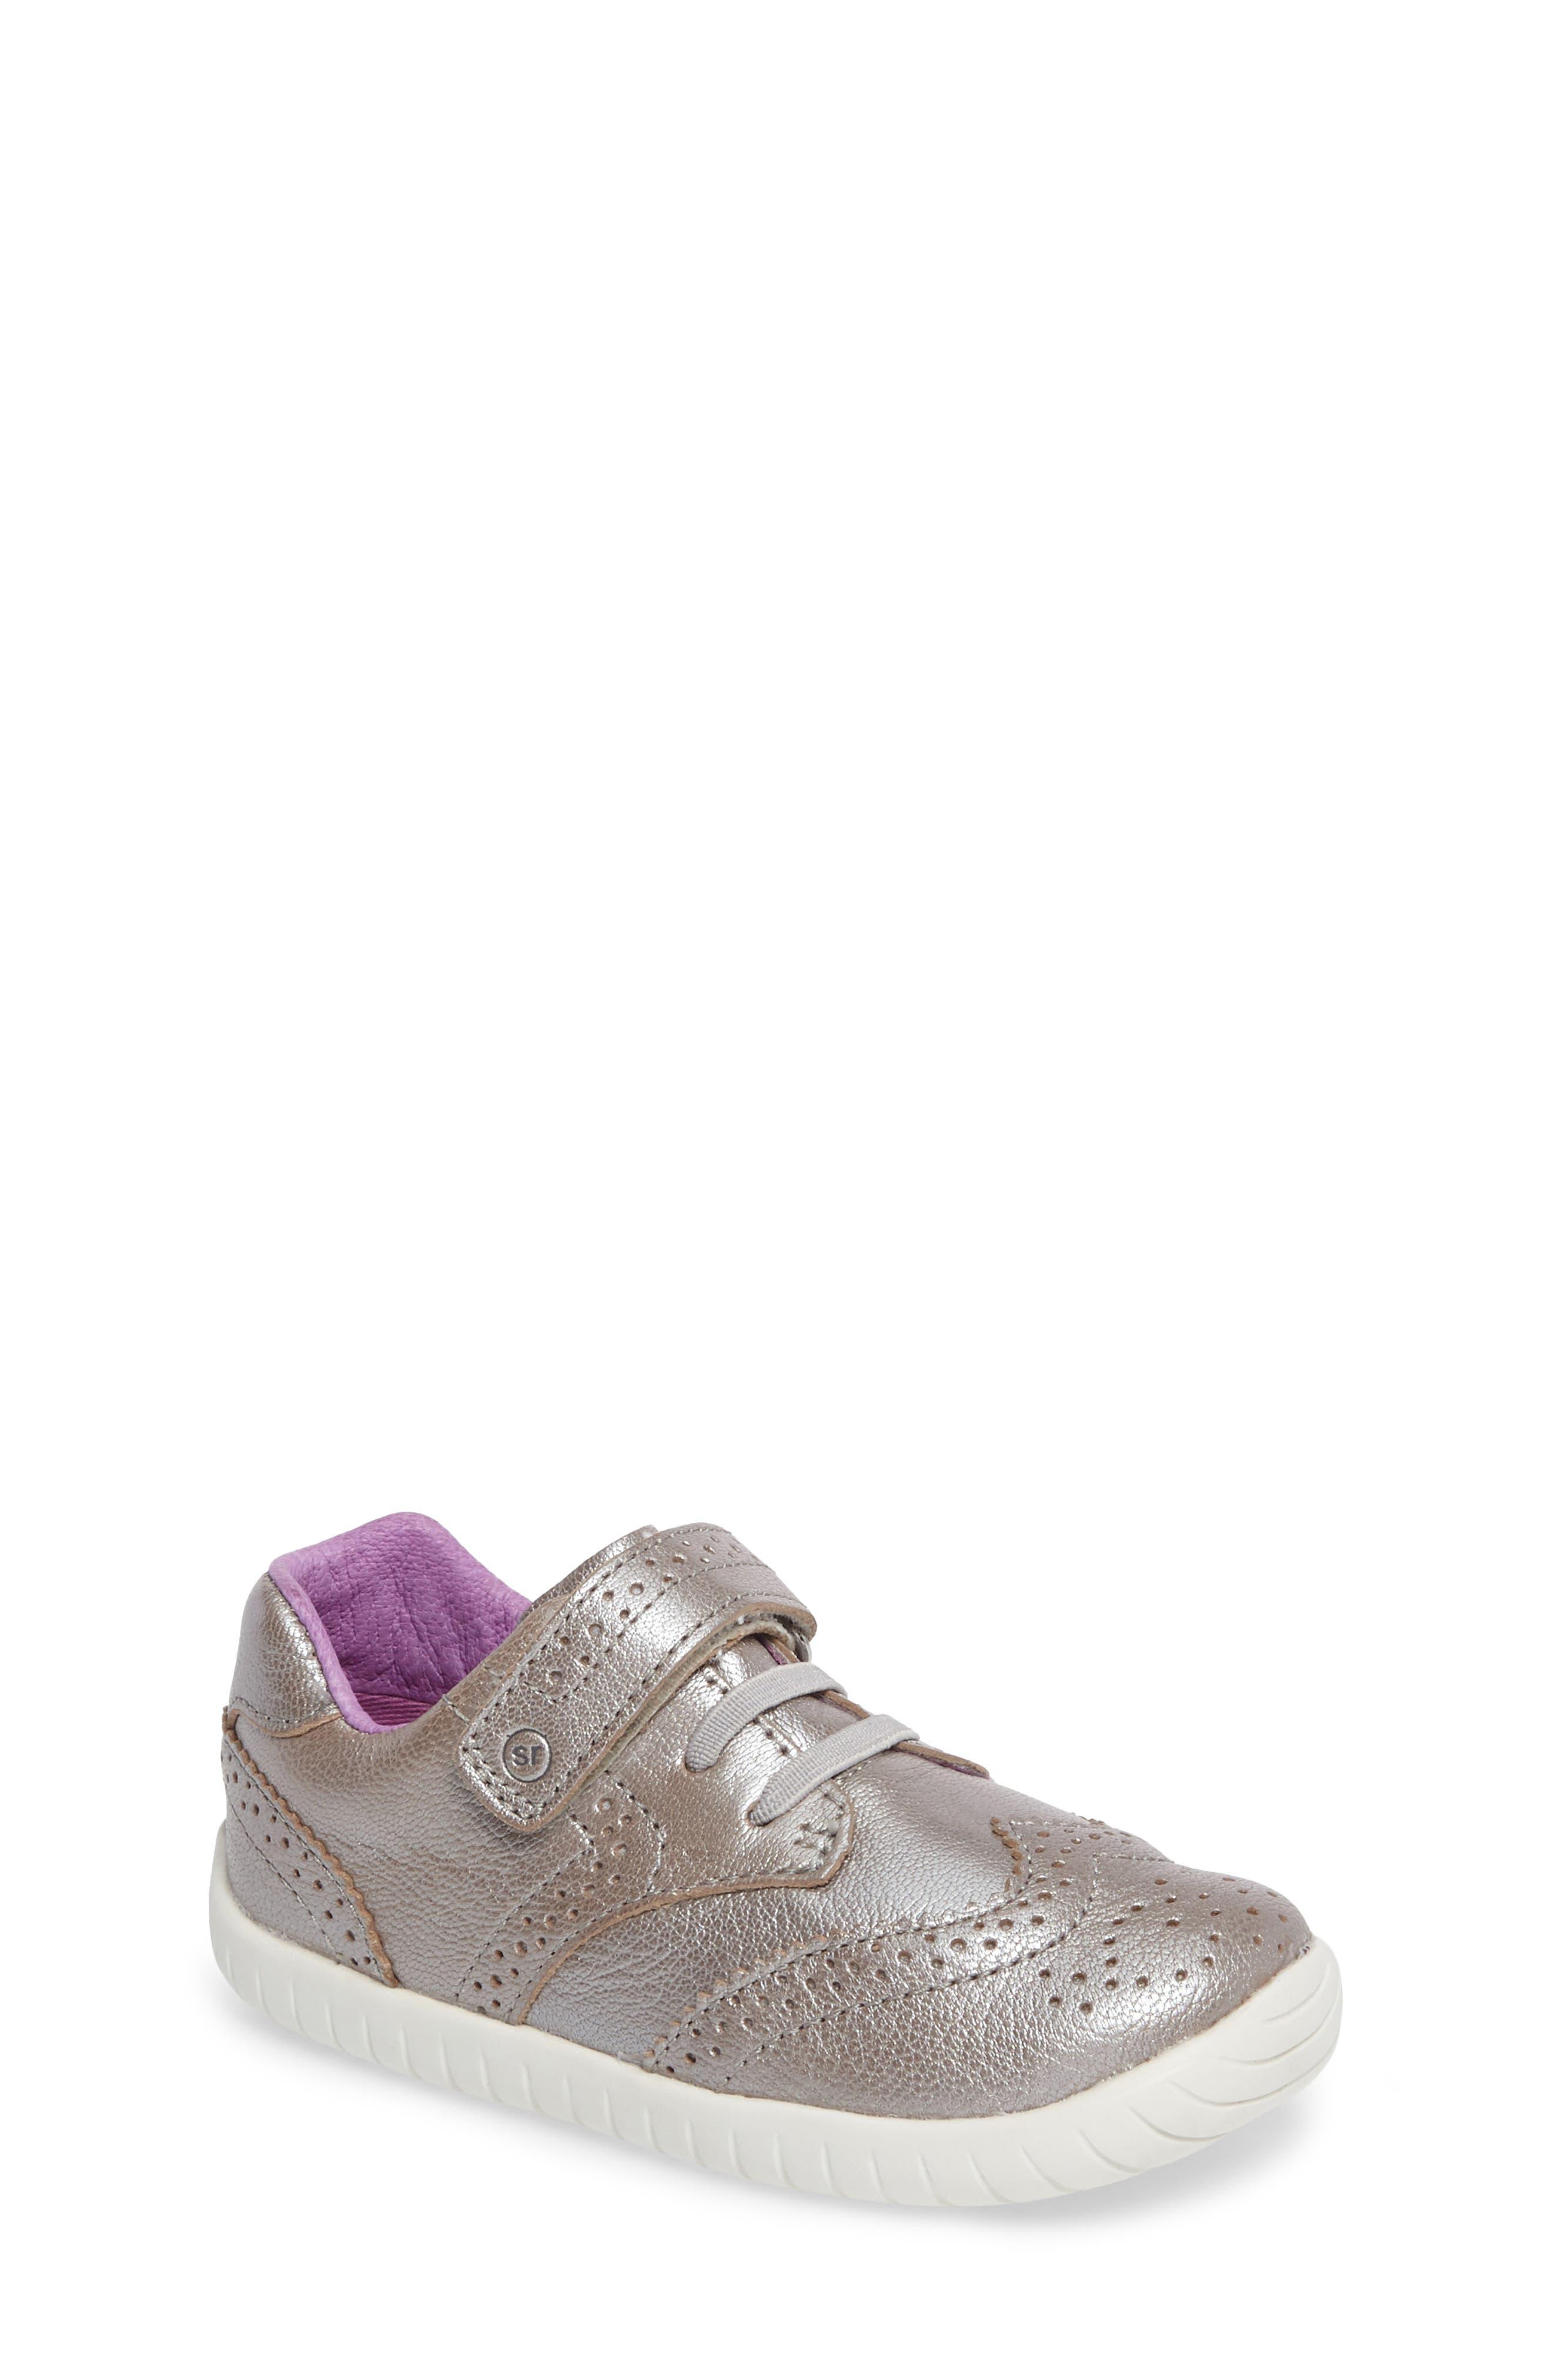 Stride Rite Addison Metallic Wingtip Sneaker (Baby, Walker & Toddler)